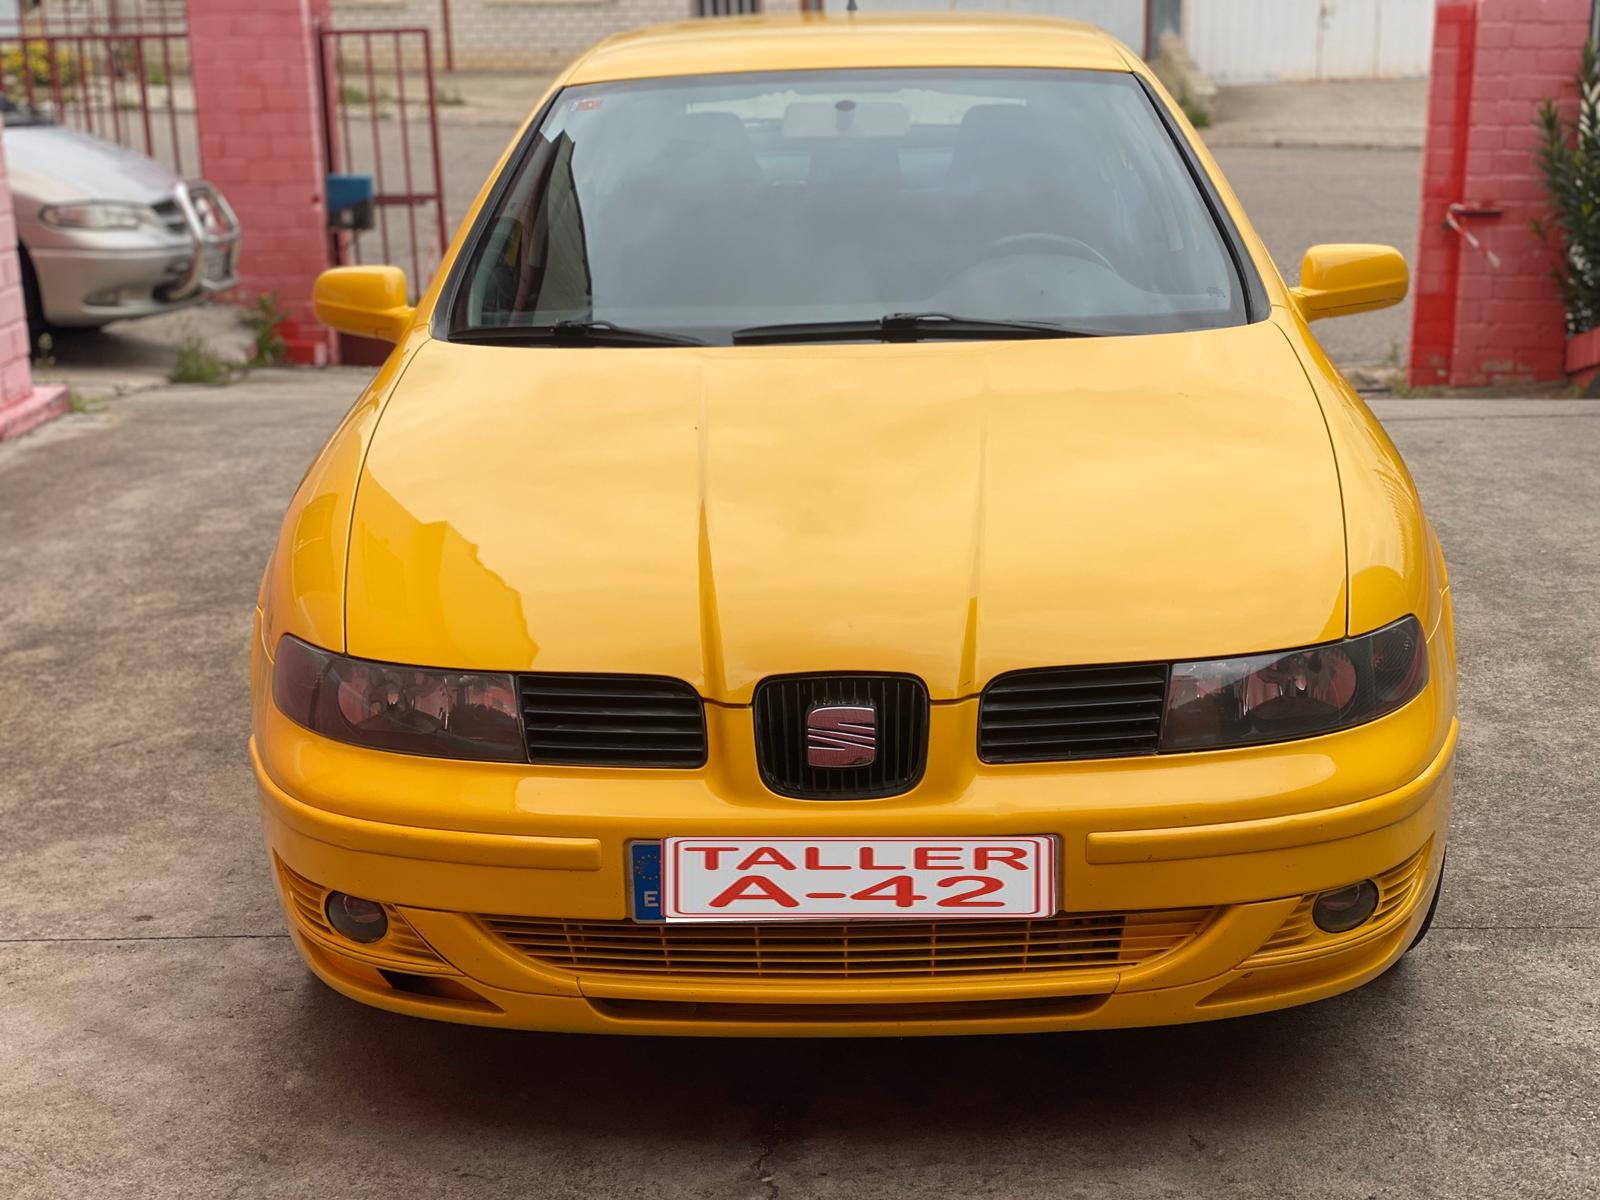 Venta Seat leon fr 1.8 turbo en toledo frontal